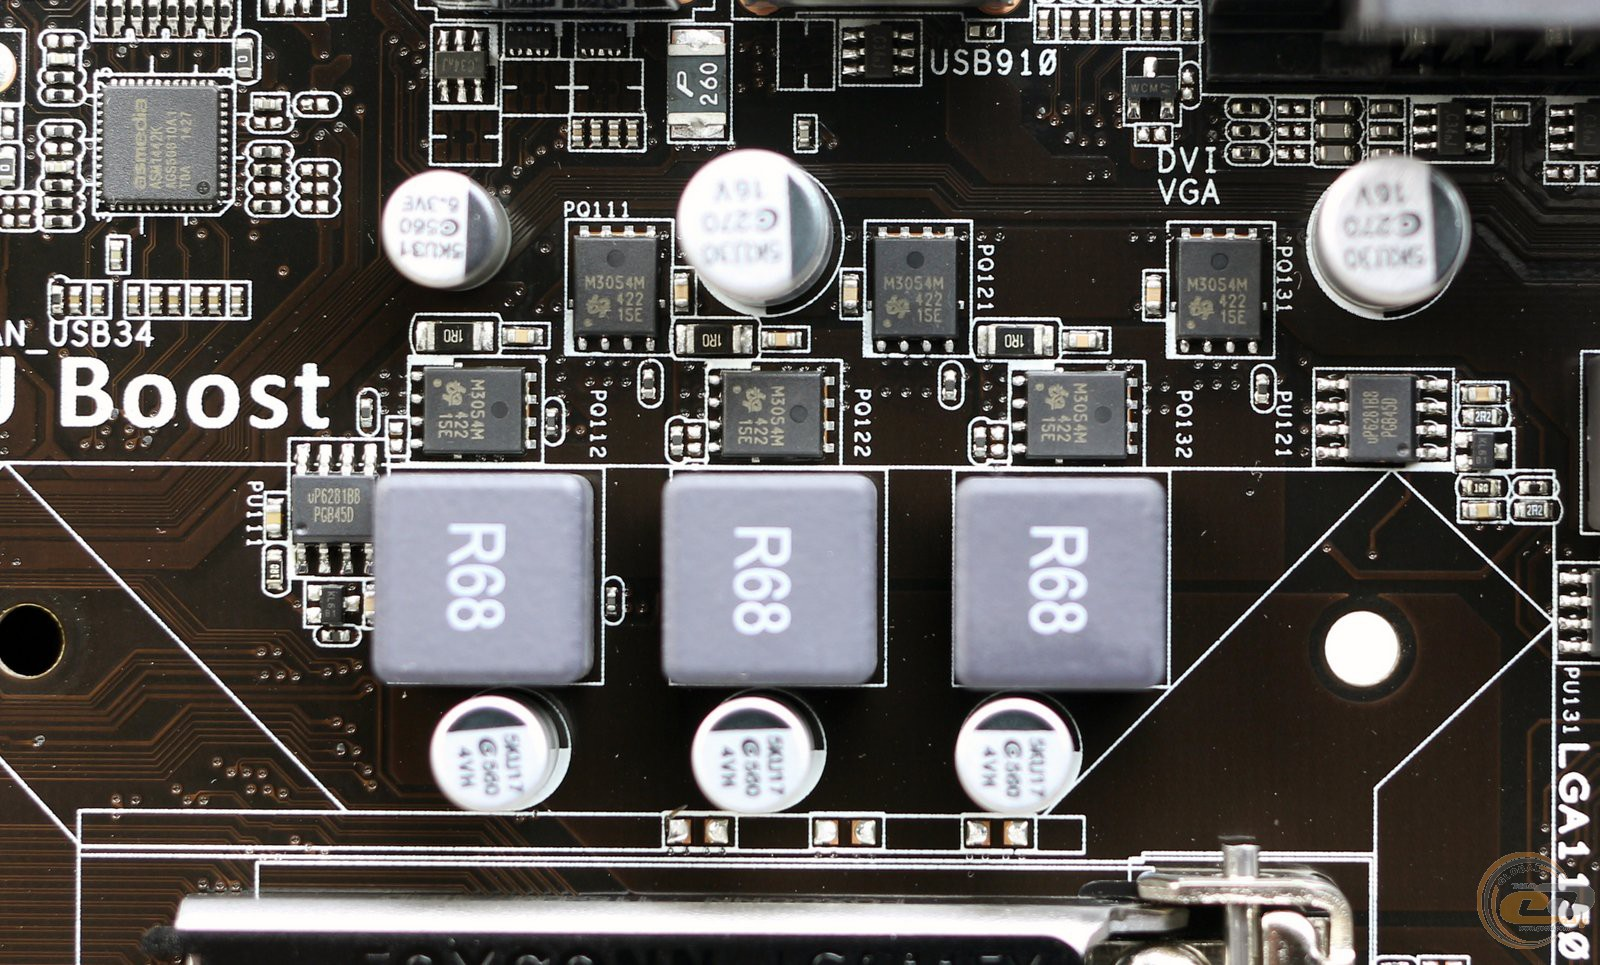 схема контроллера винчестера samsung hd502hj